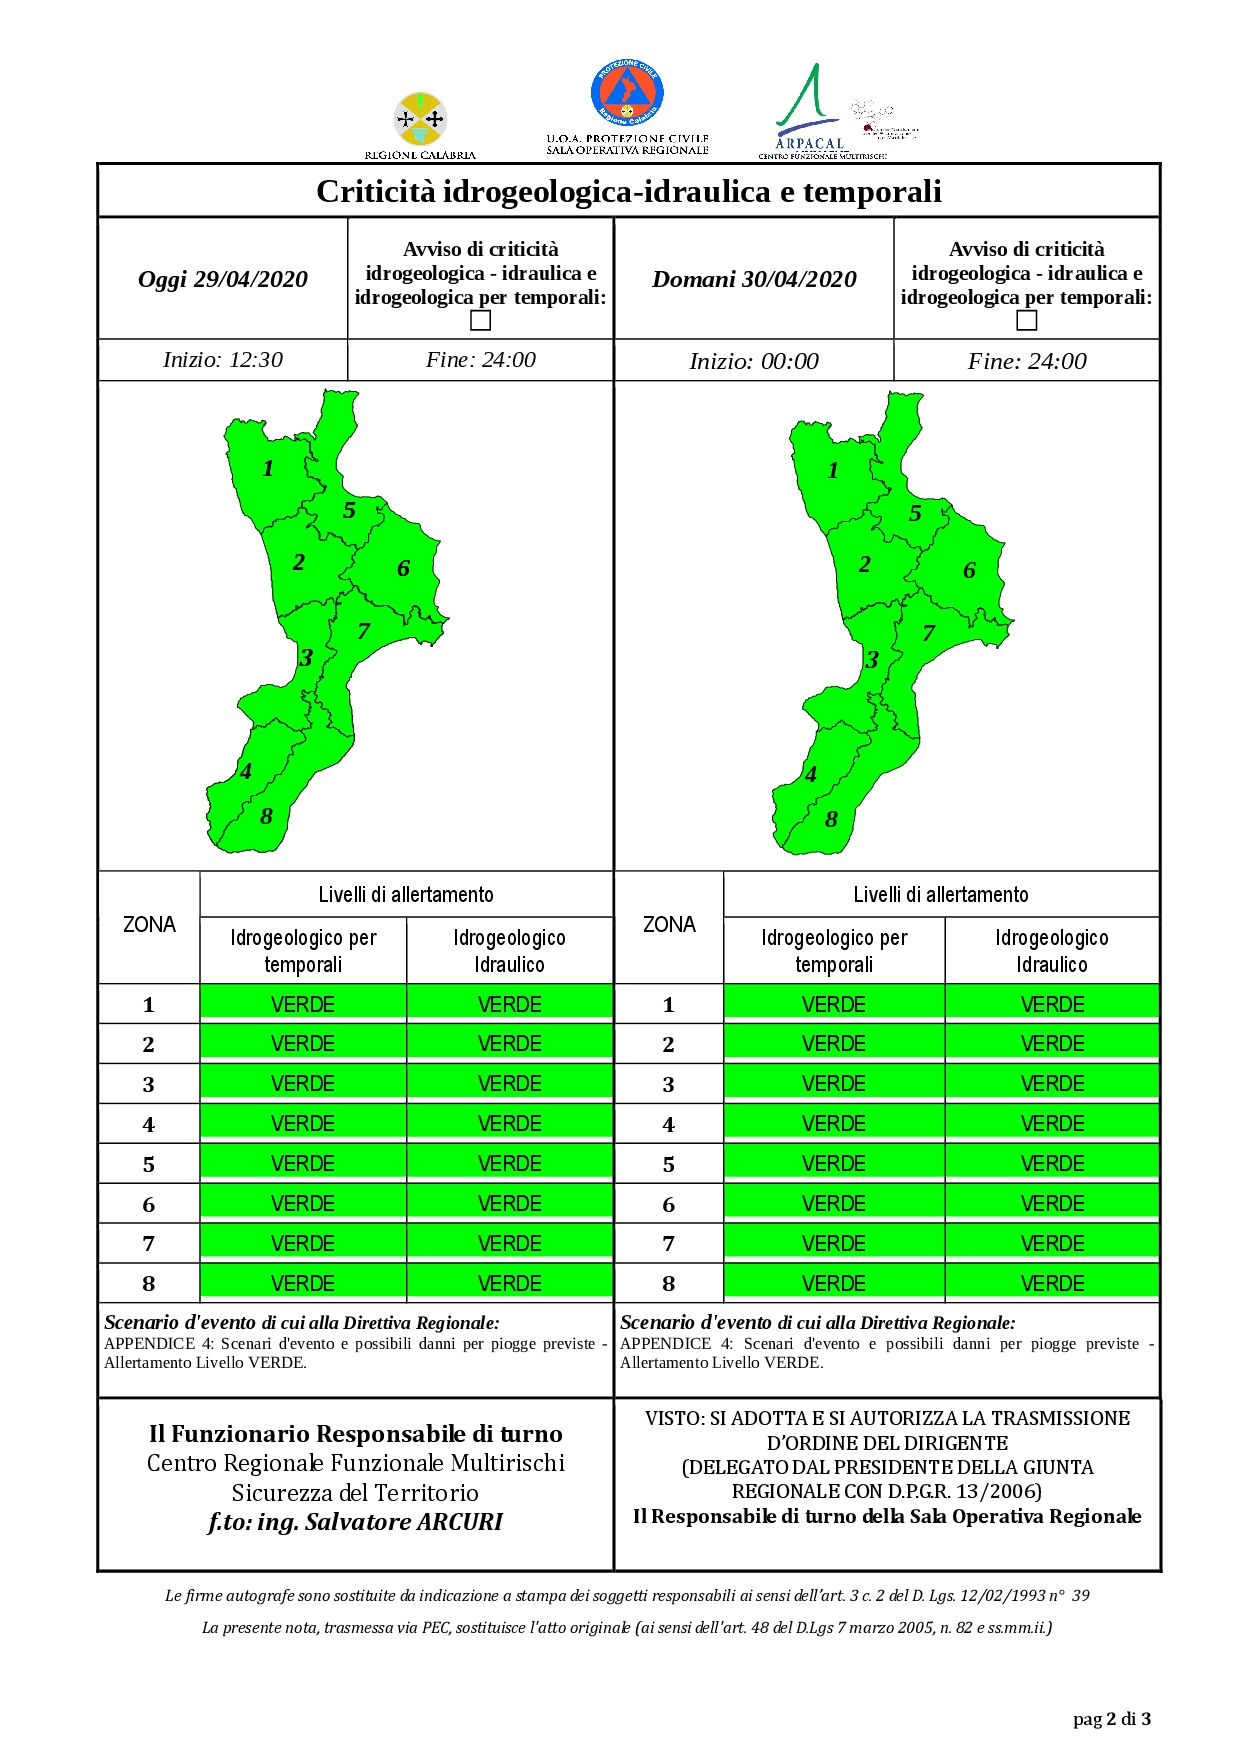 Criticità idrogeologica-idraulica e temporali in Calabria 29-04-2020